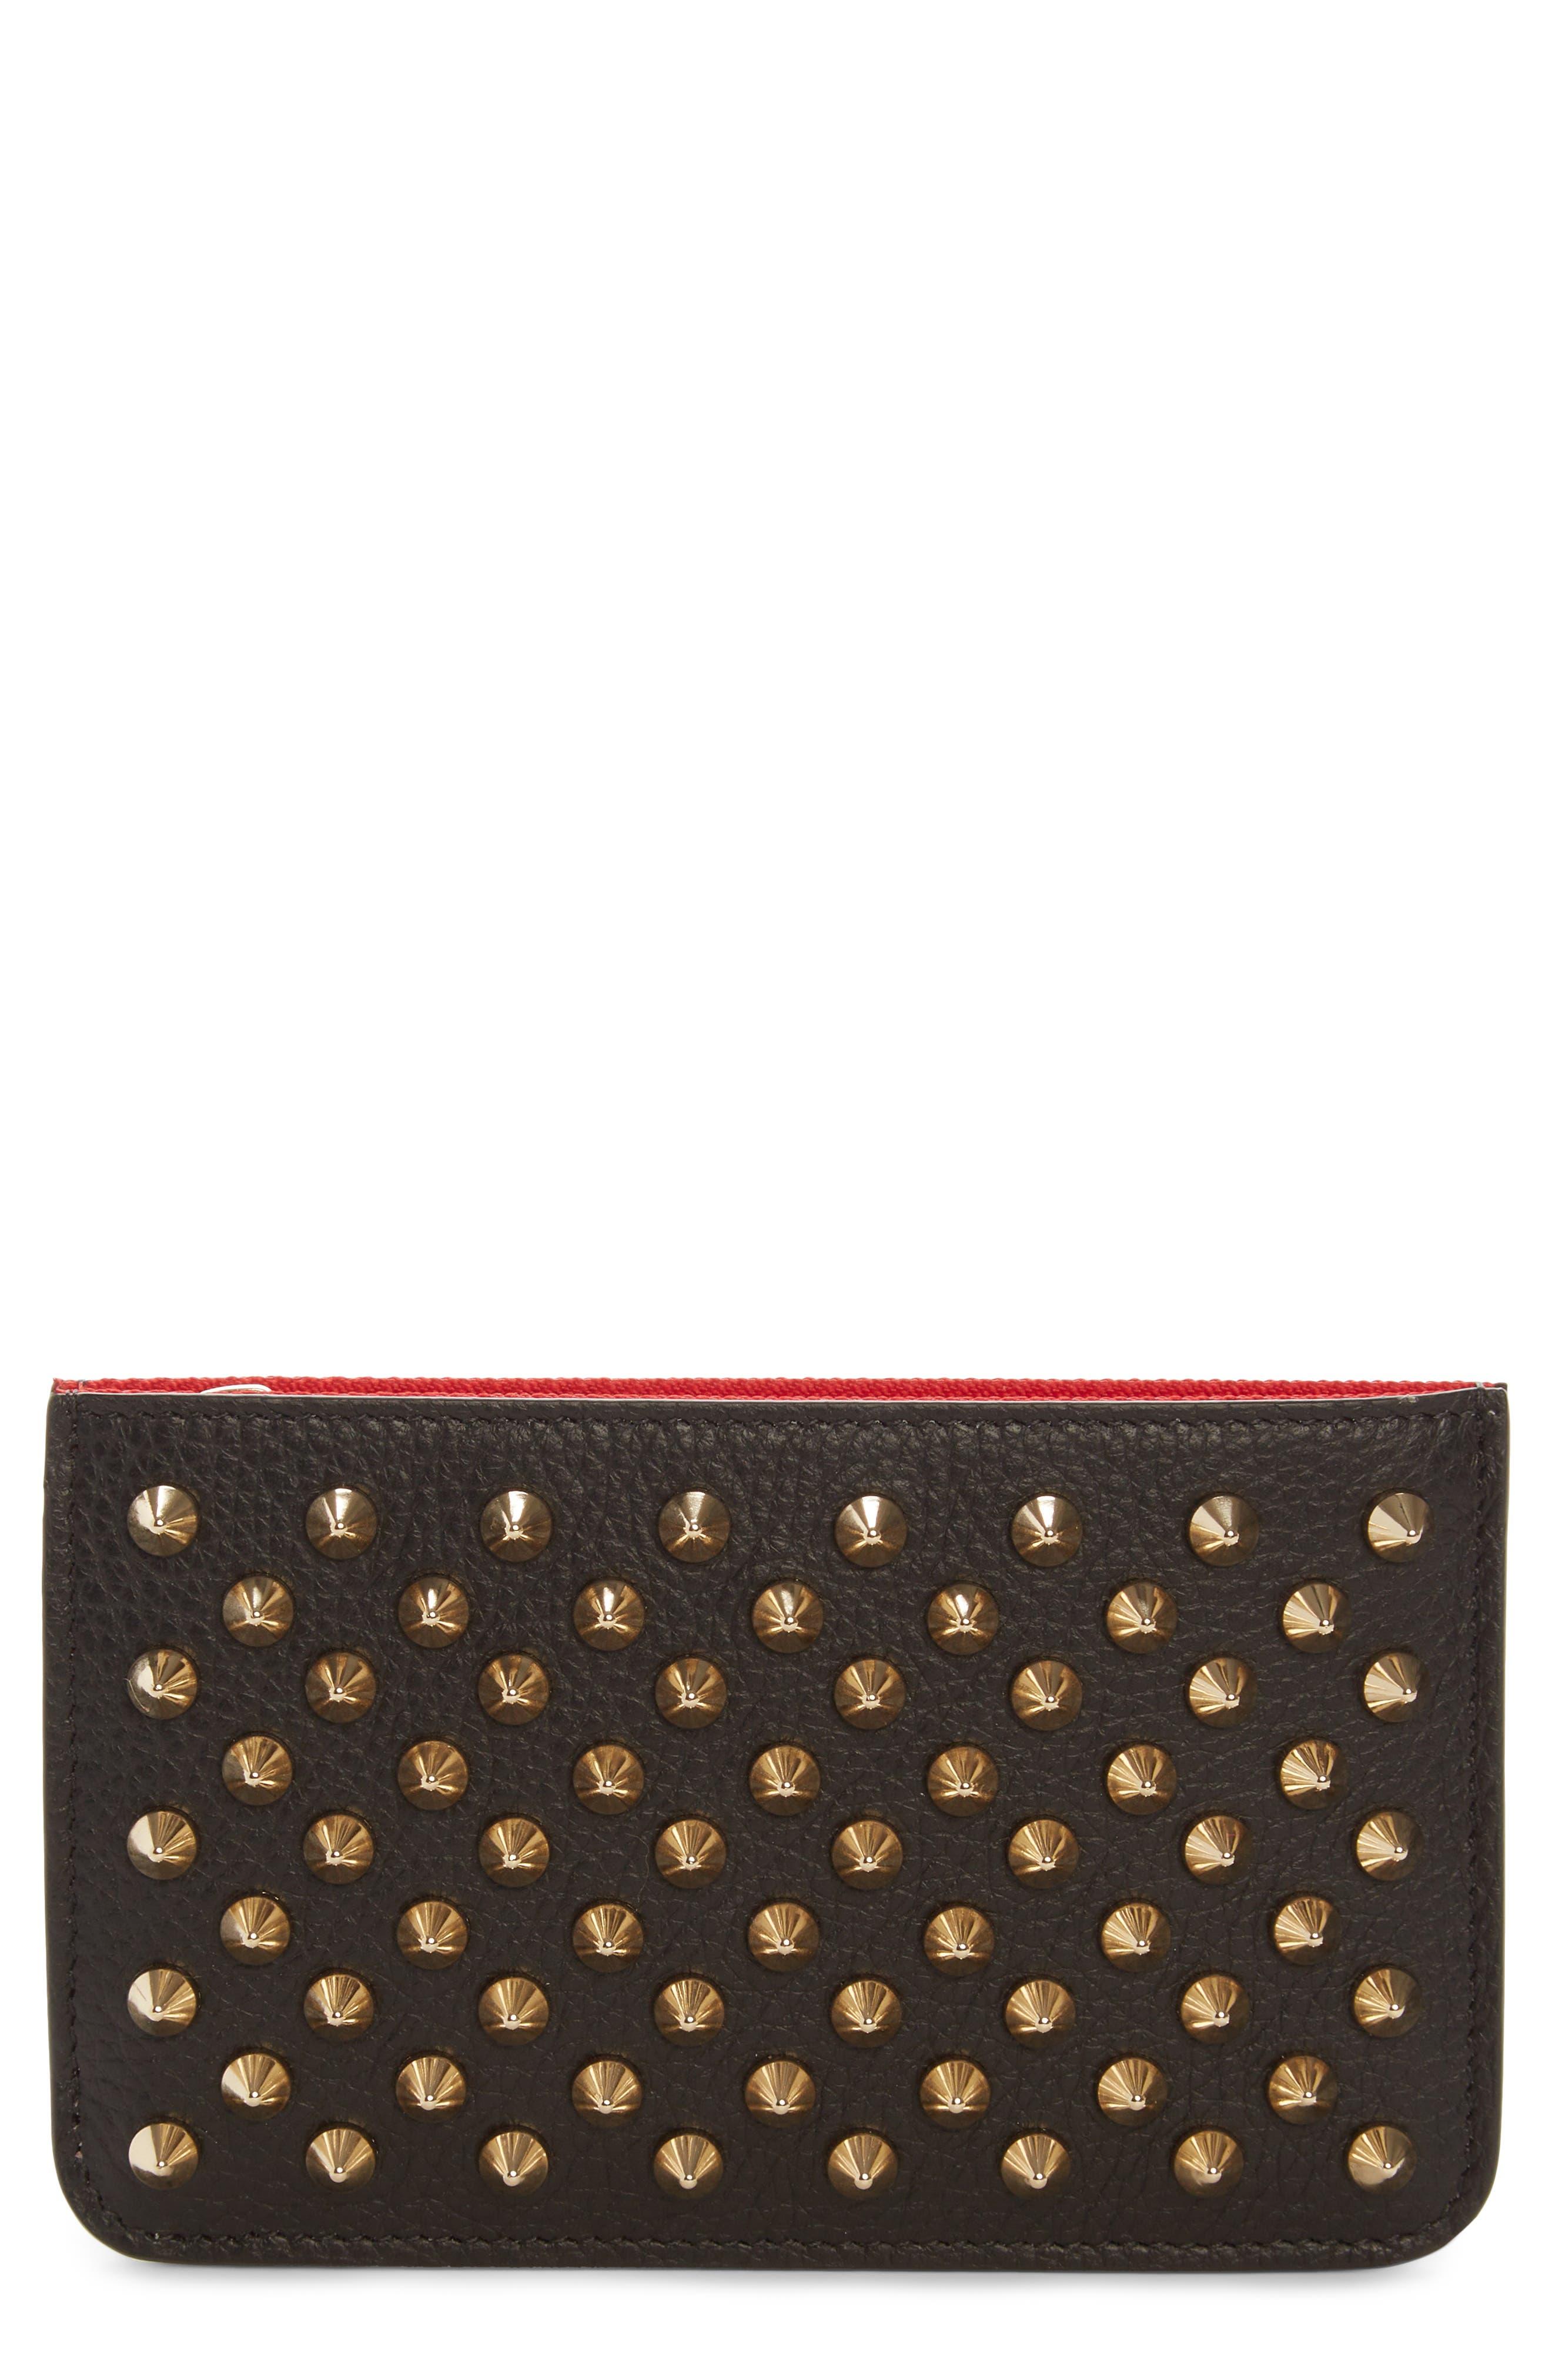 Alternate Image 1 Selected - Christian Louboutin Panettone Studded Leather Key Case